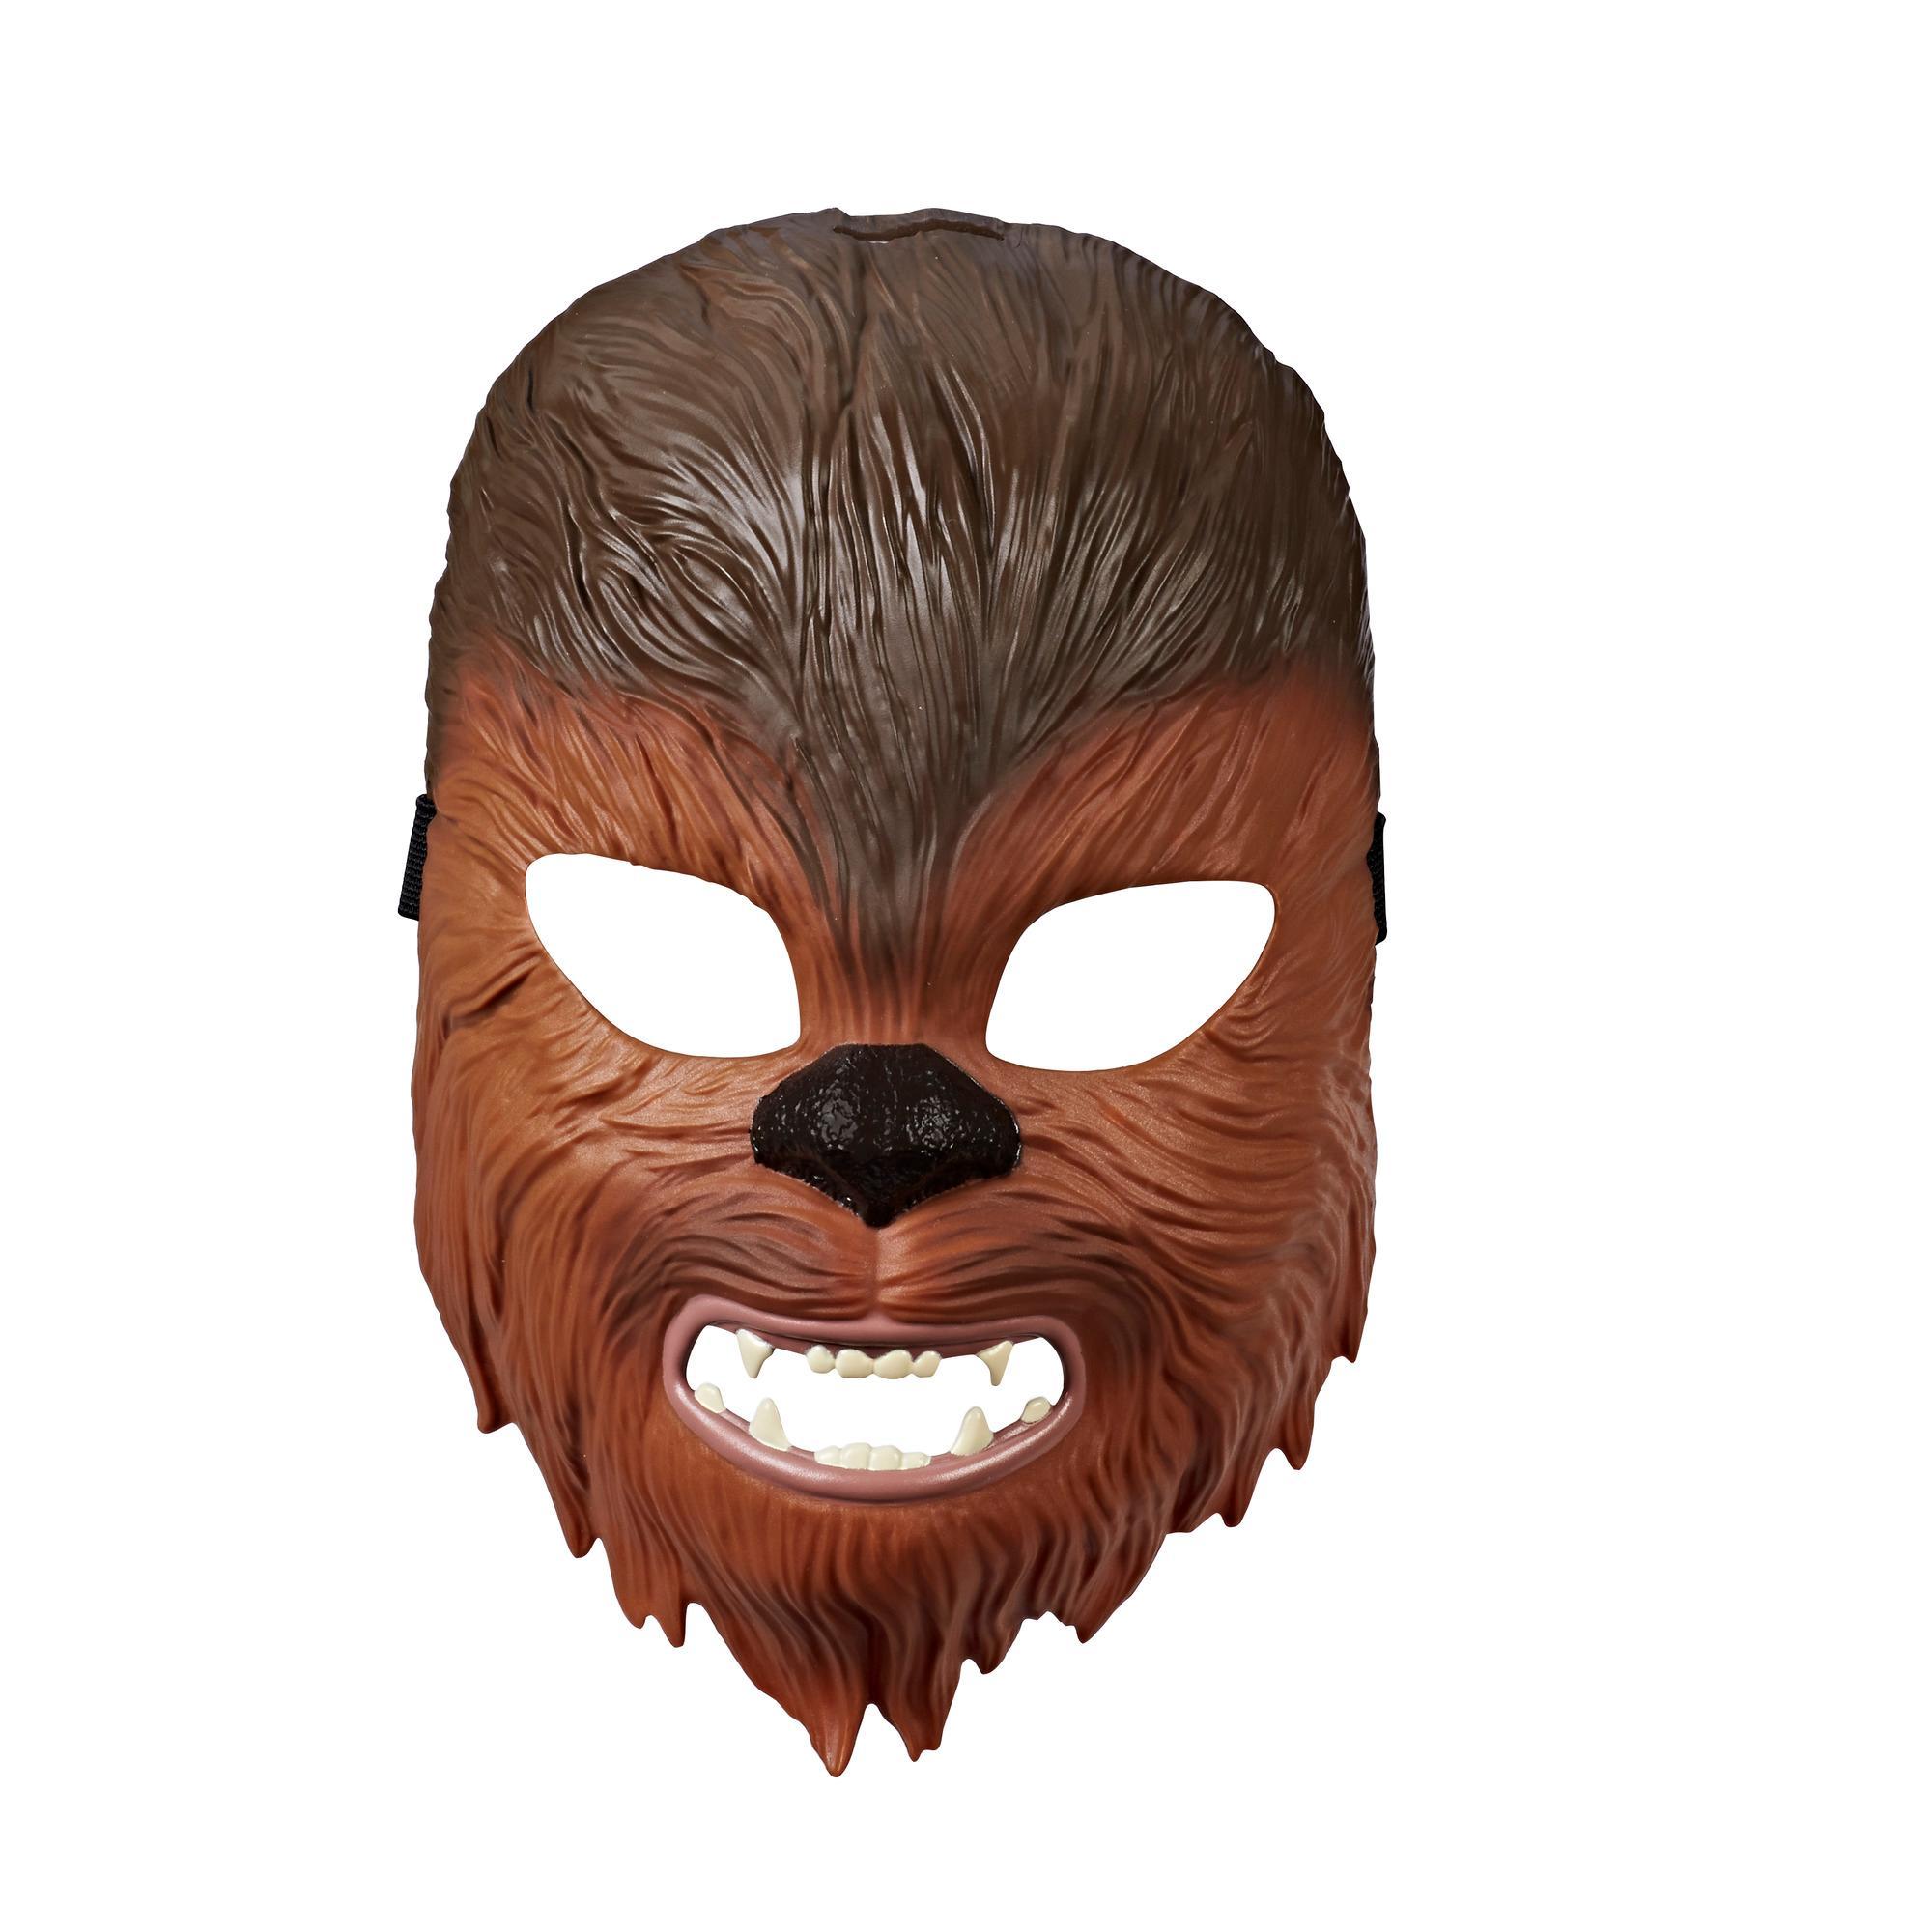 Star Wars Han Solo: Uma História Star Wars - Máscara de Chewbacca